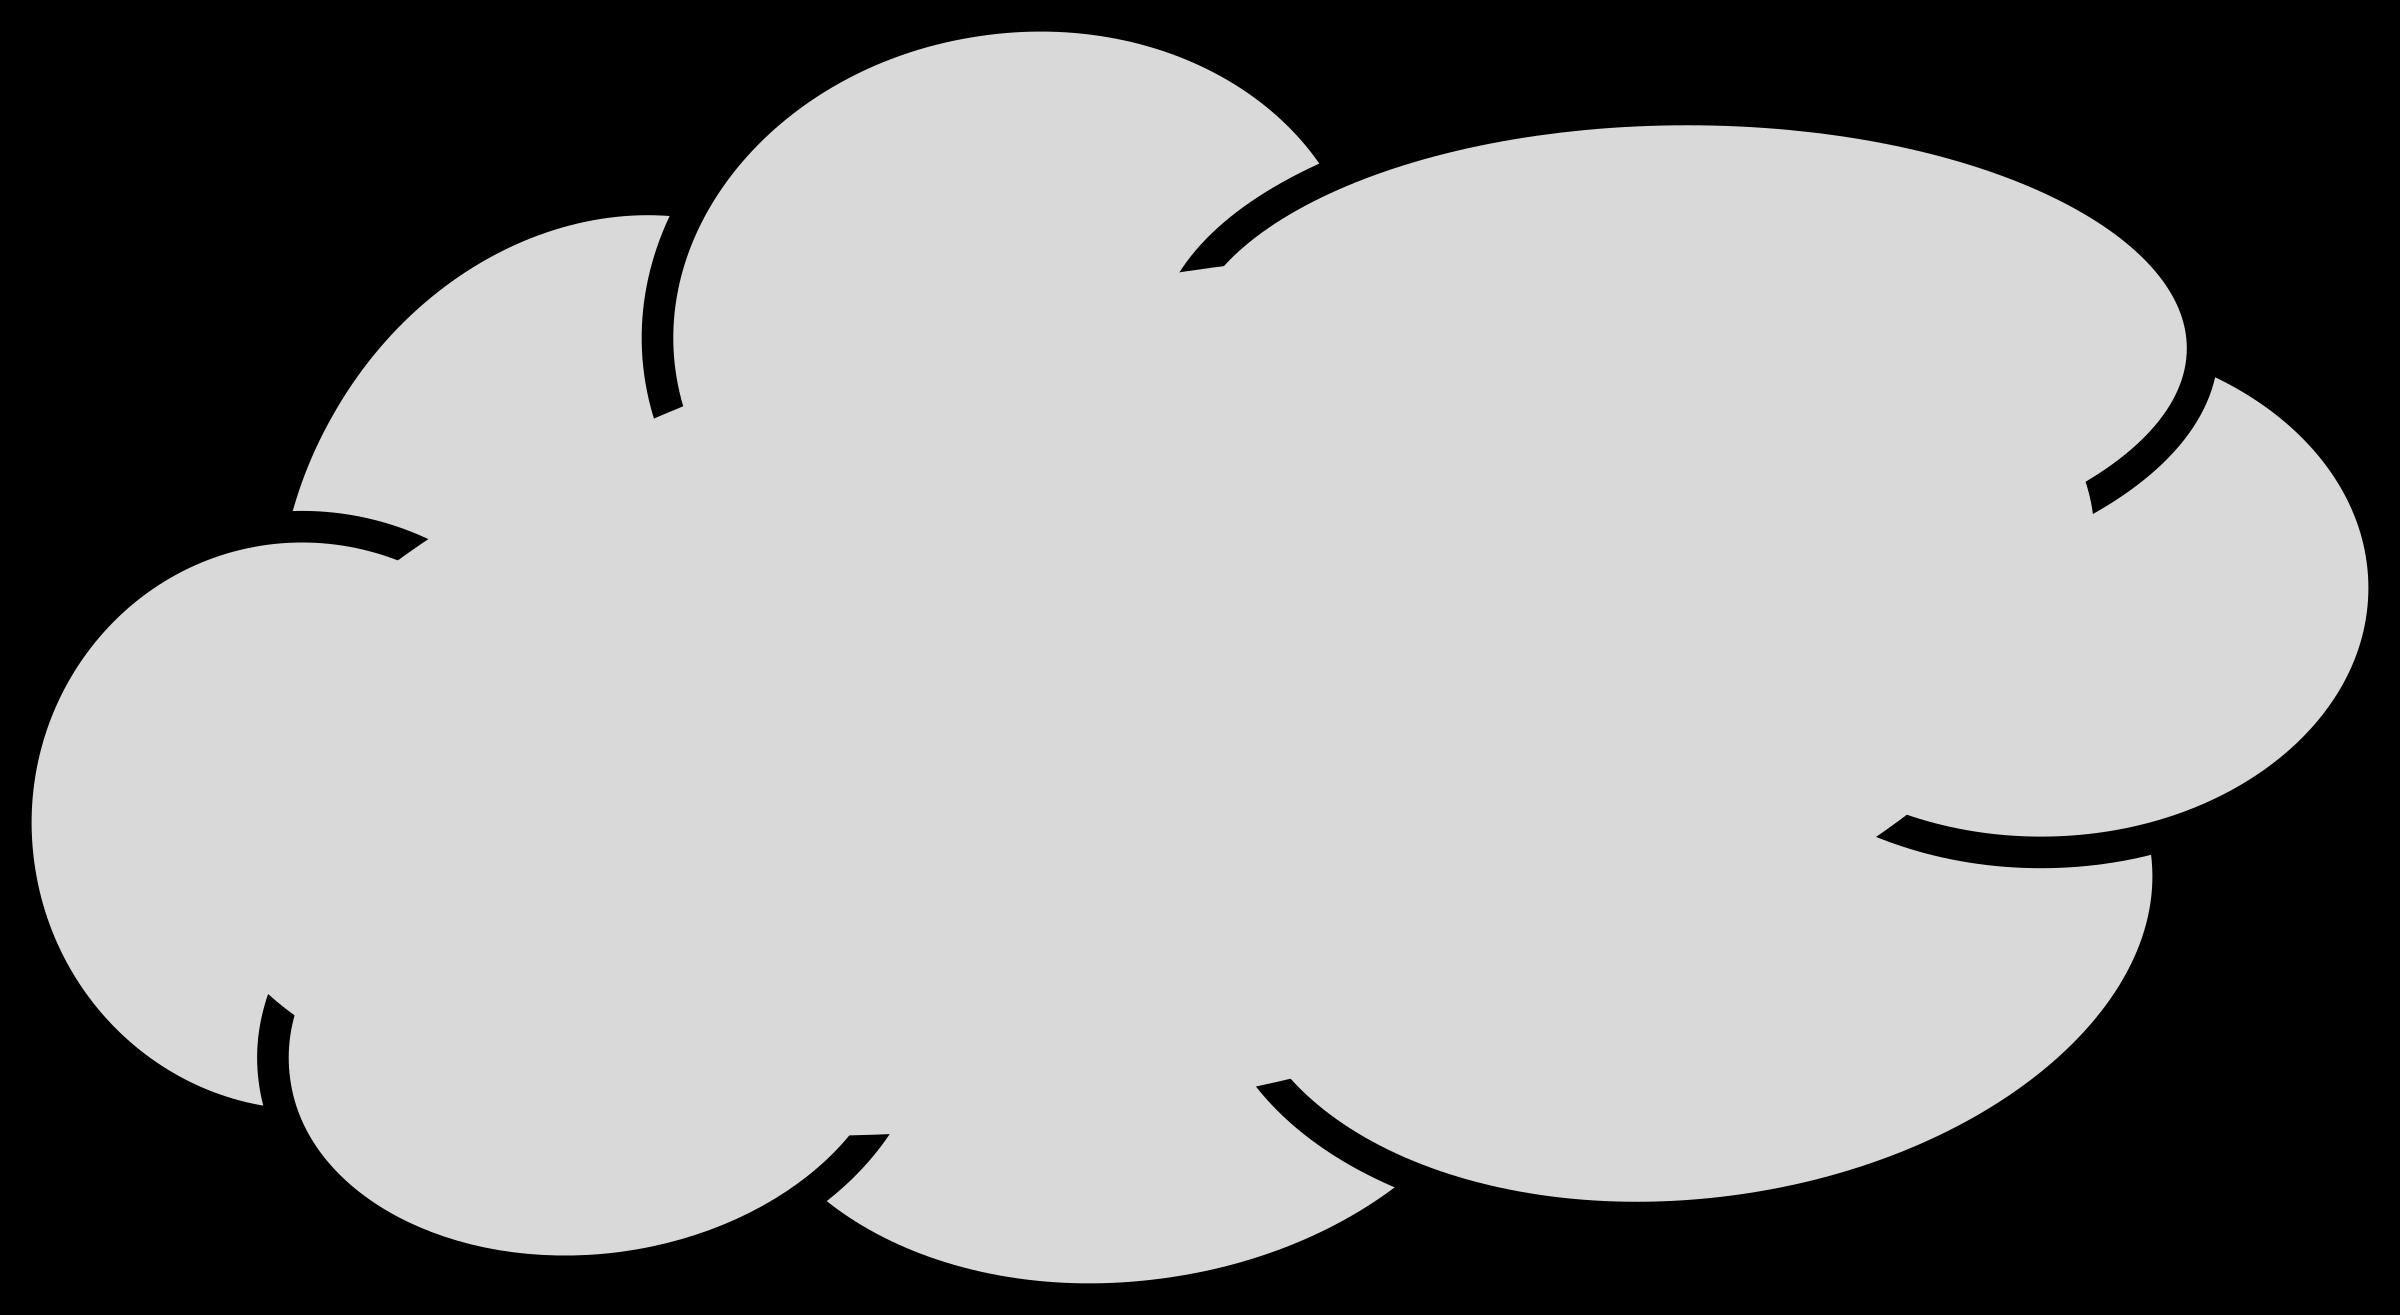 2400x1315 Rain Cloud Free Clip Art Of Cloud Clipart Black And White 4 Grey